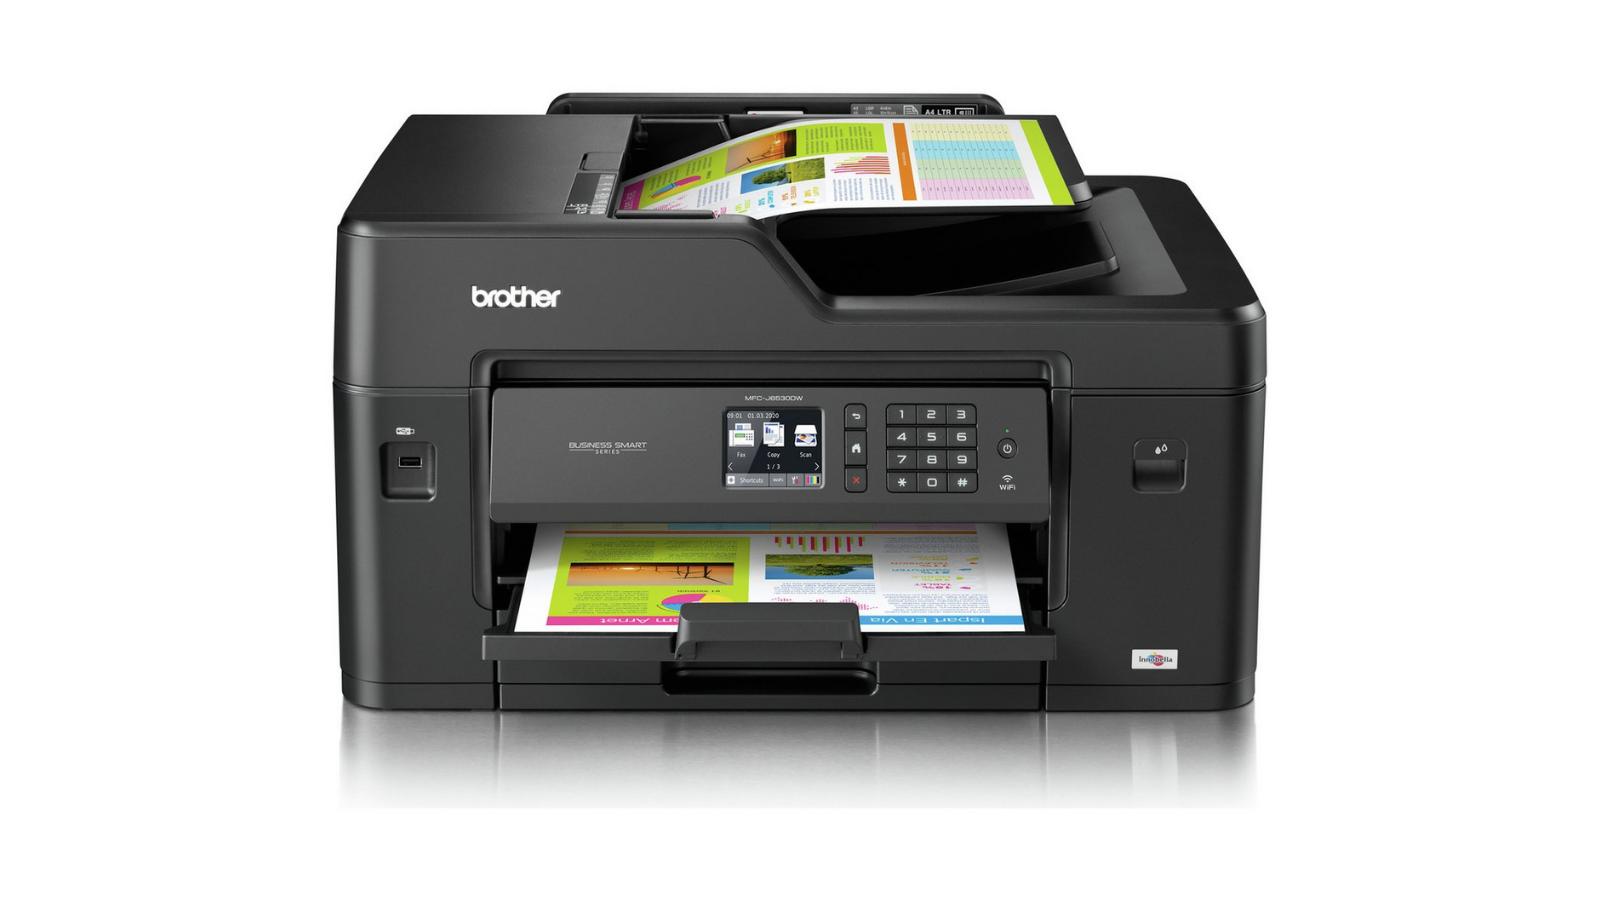 Best Printer Deals In October 2018 Cheap Inkjet And Laser